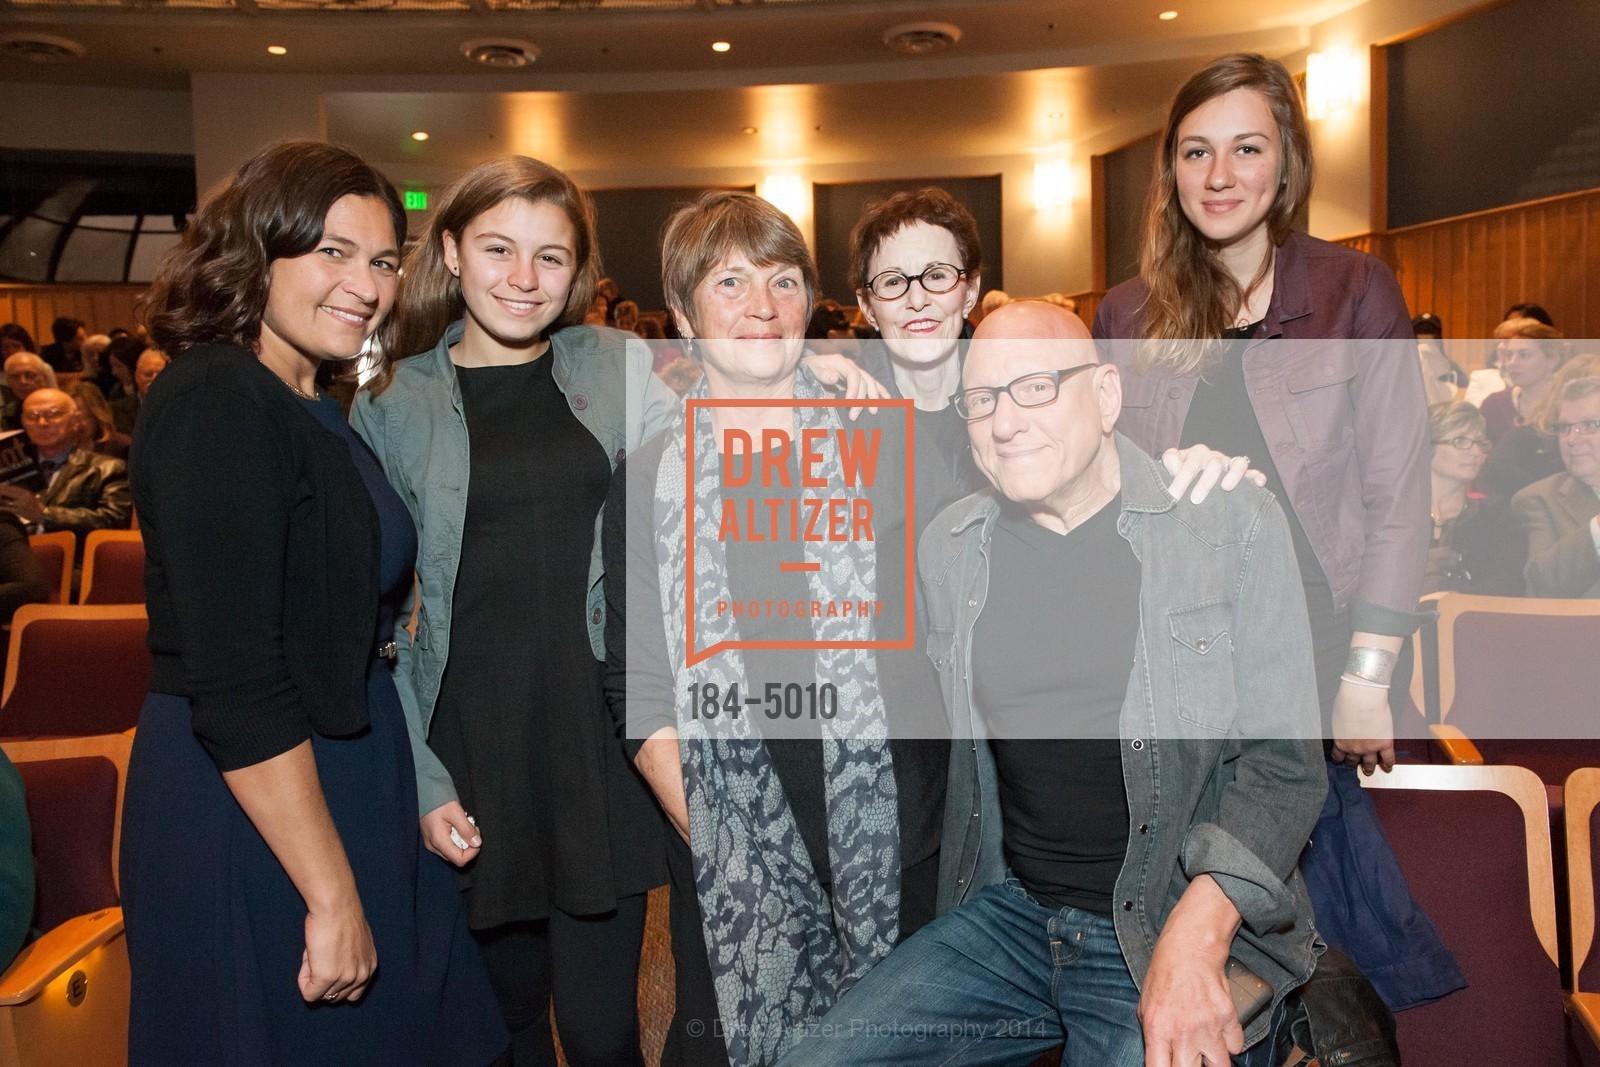 Regan Pritzker, Maya Olin, Susan Pritzker, Linda Bryant, Nick Pritzker, Margaux Robilliard, Photo #184-5010